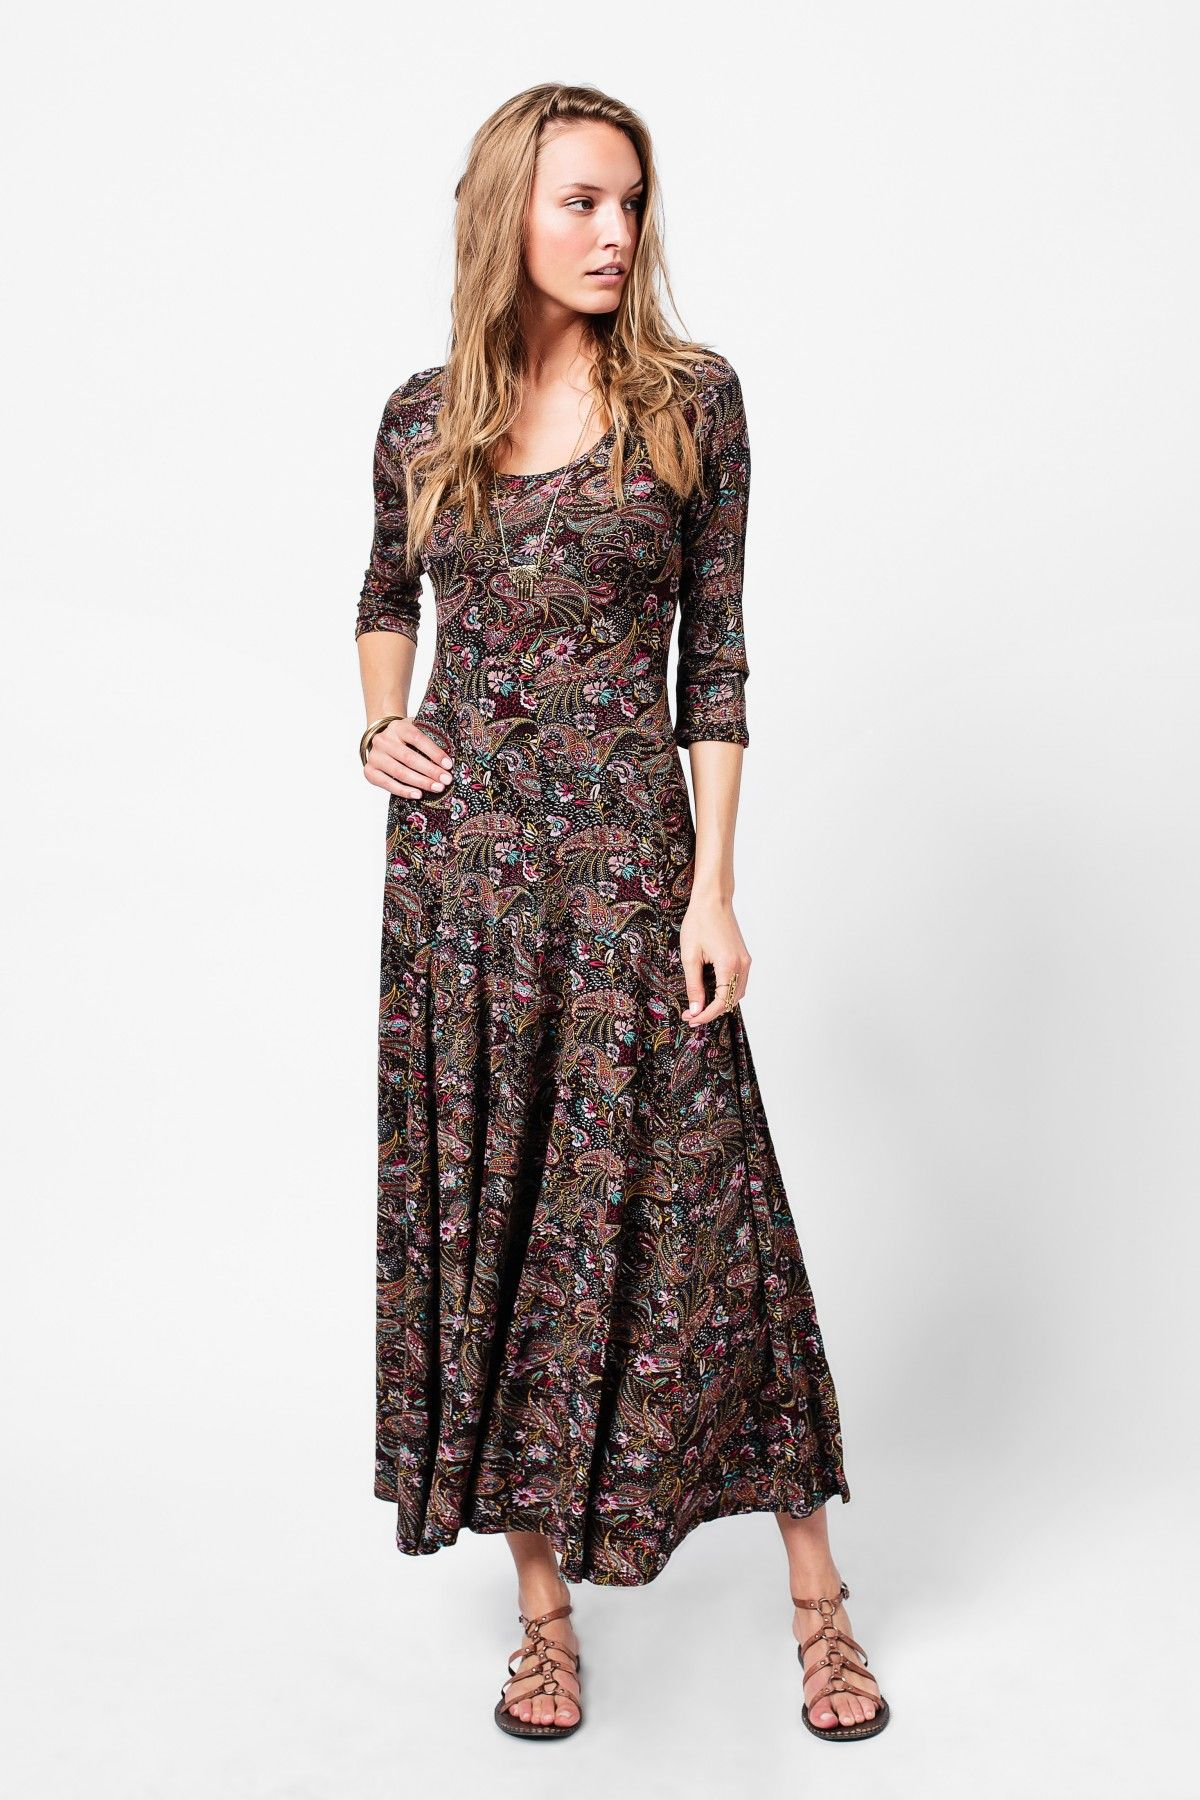 23fa090a6b97 Boho Paisley Maxi Dress - Women's - Earthbound Trading Co. | My ...